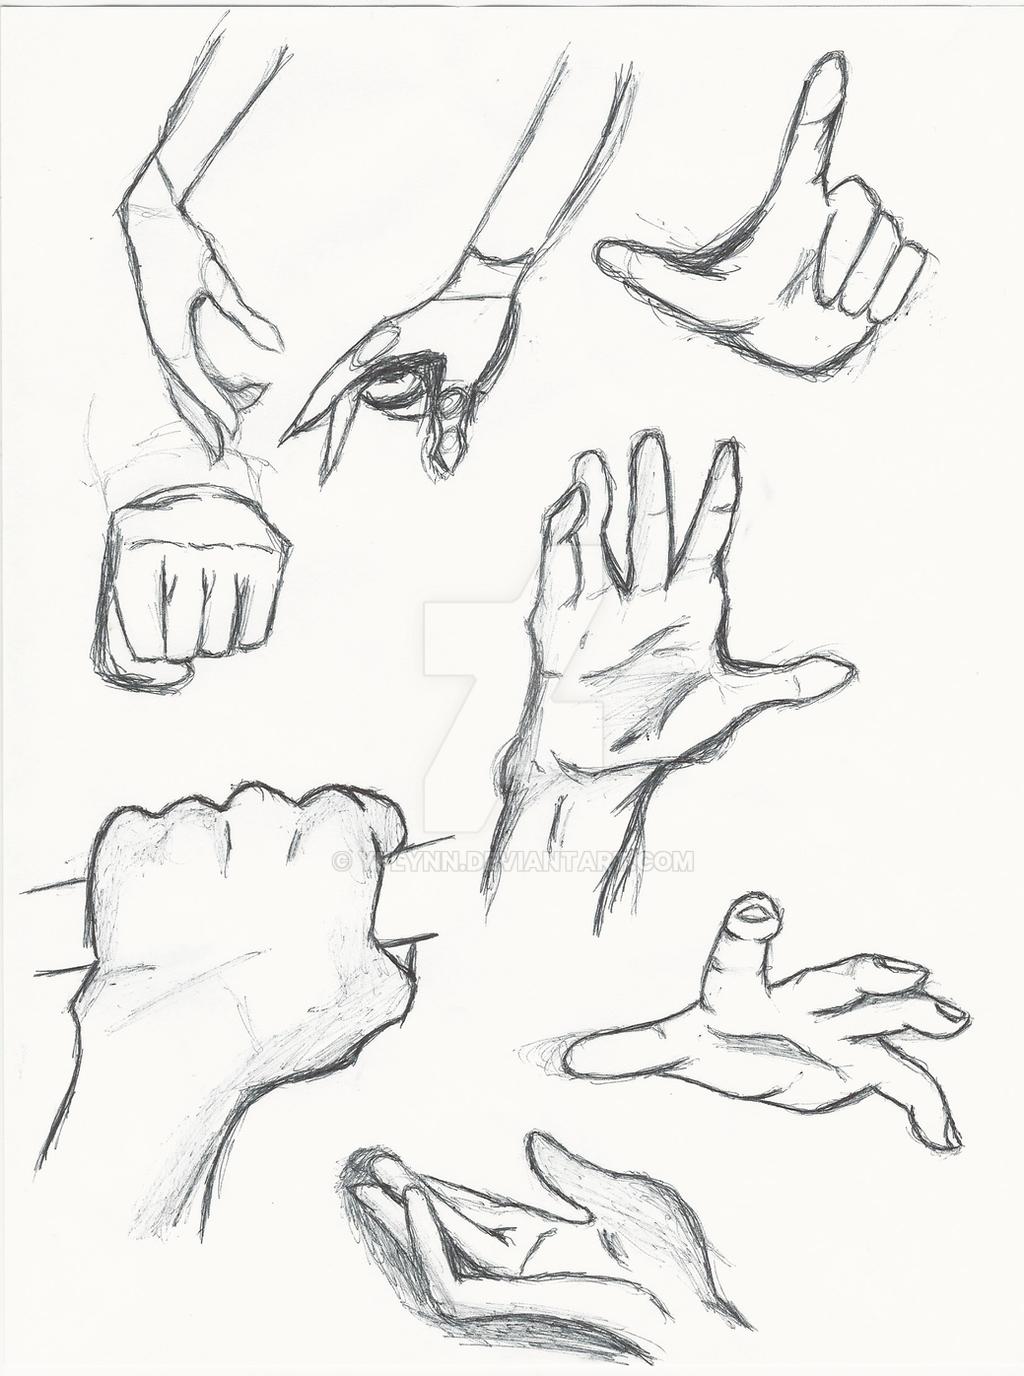 Best 25+ Hand sketch ideas on Pinterest | Hand drawings ...